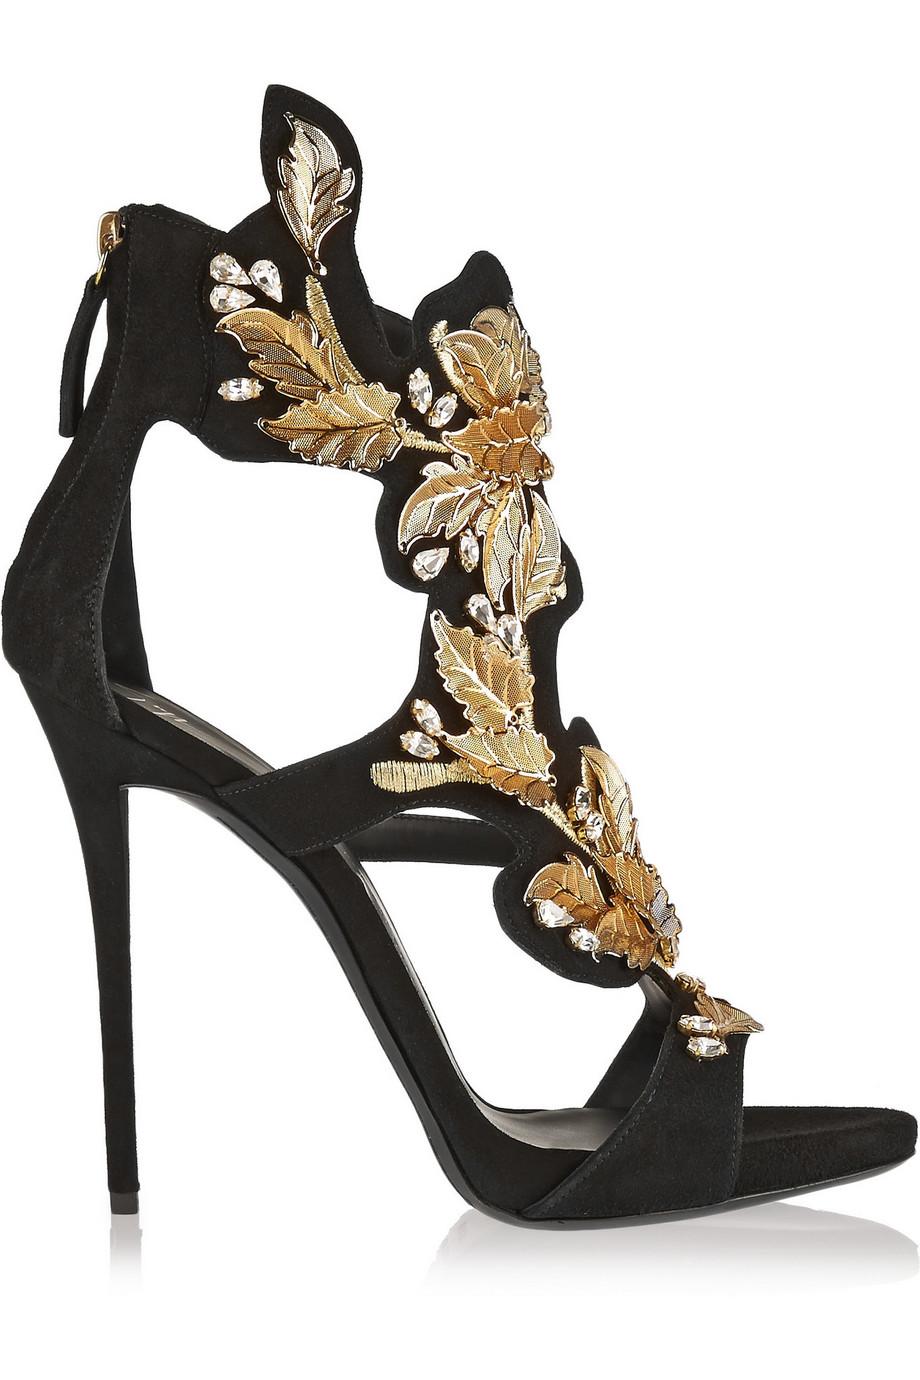 Cerruti  Shoes Price